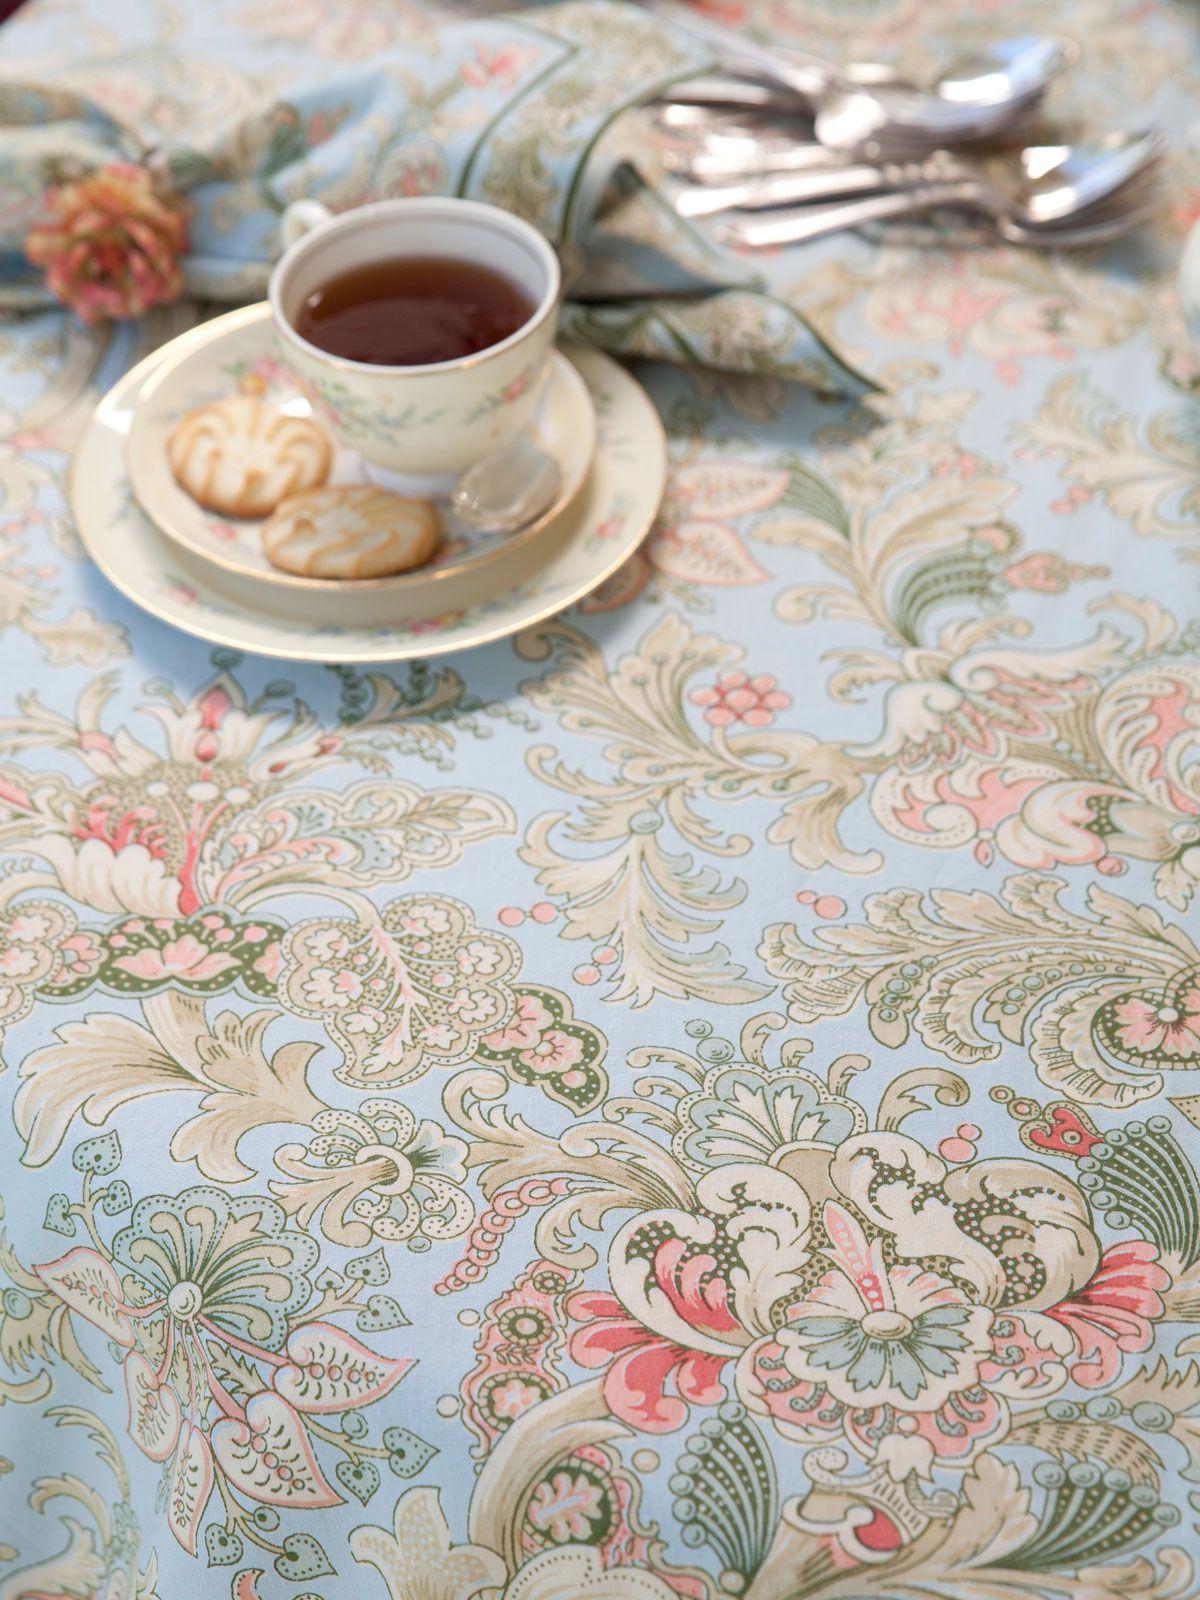 Jacobu0027s Court Tablecloth | Linens U0026 Kitchen, Tablecloths :Beautiful Designs  By April Cornell